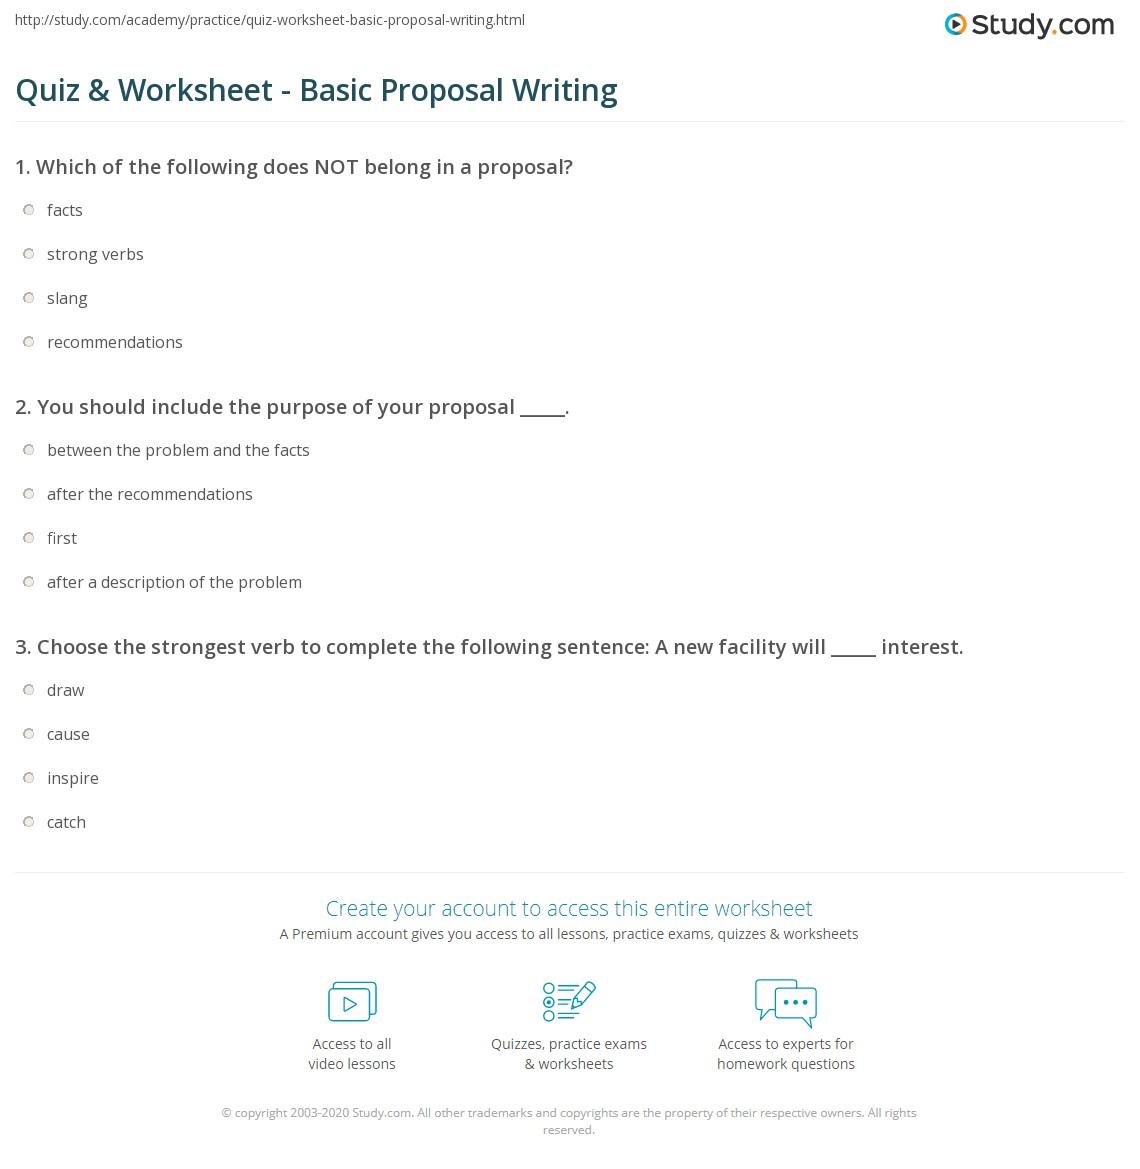 Quiz & Worksheet - Basic Proposal Writing | Study.com